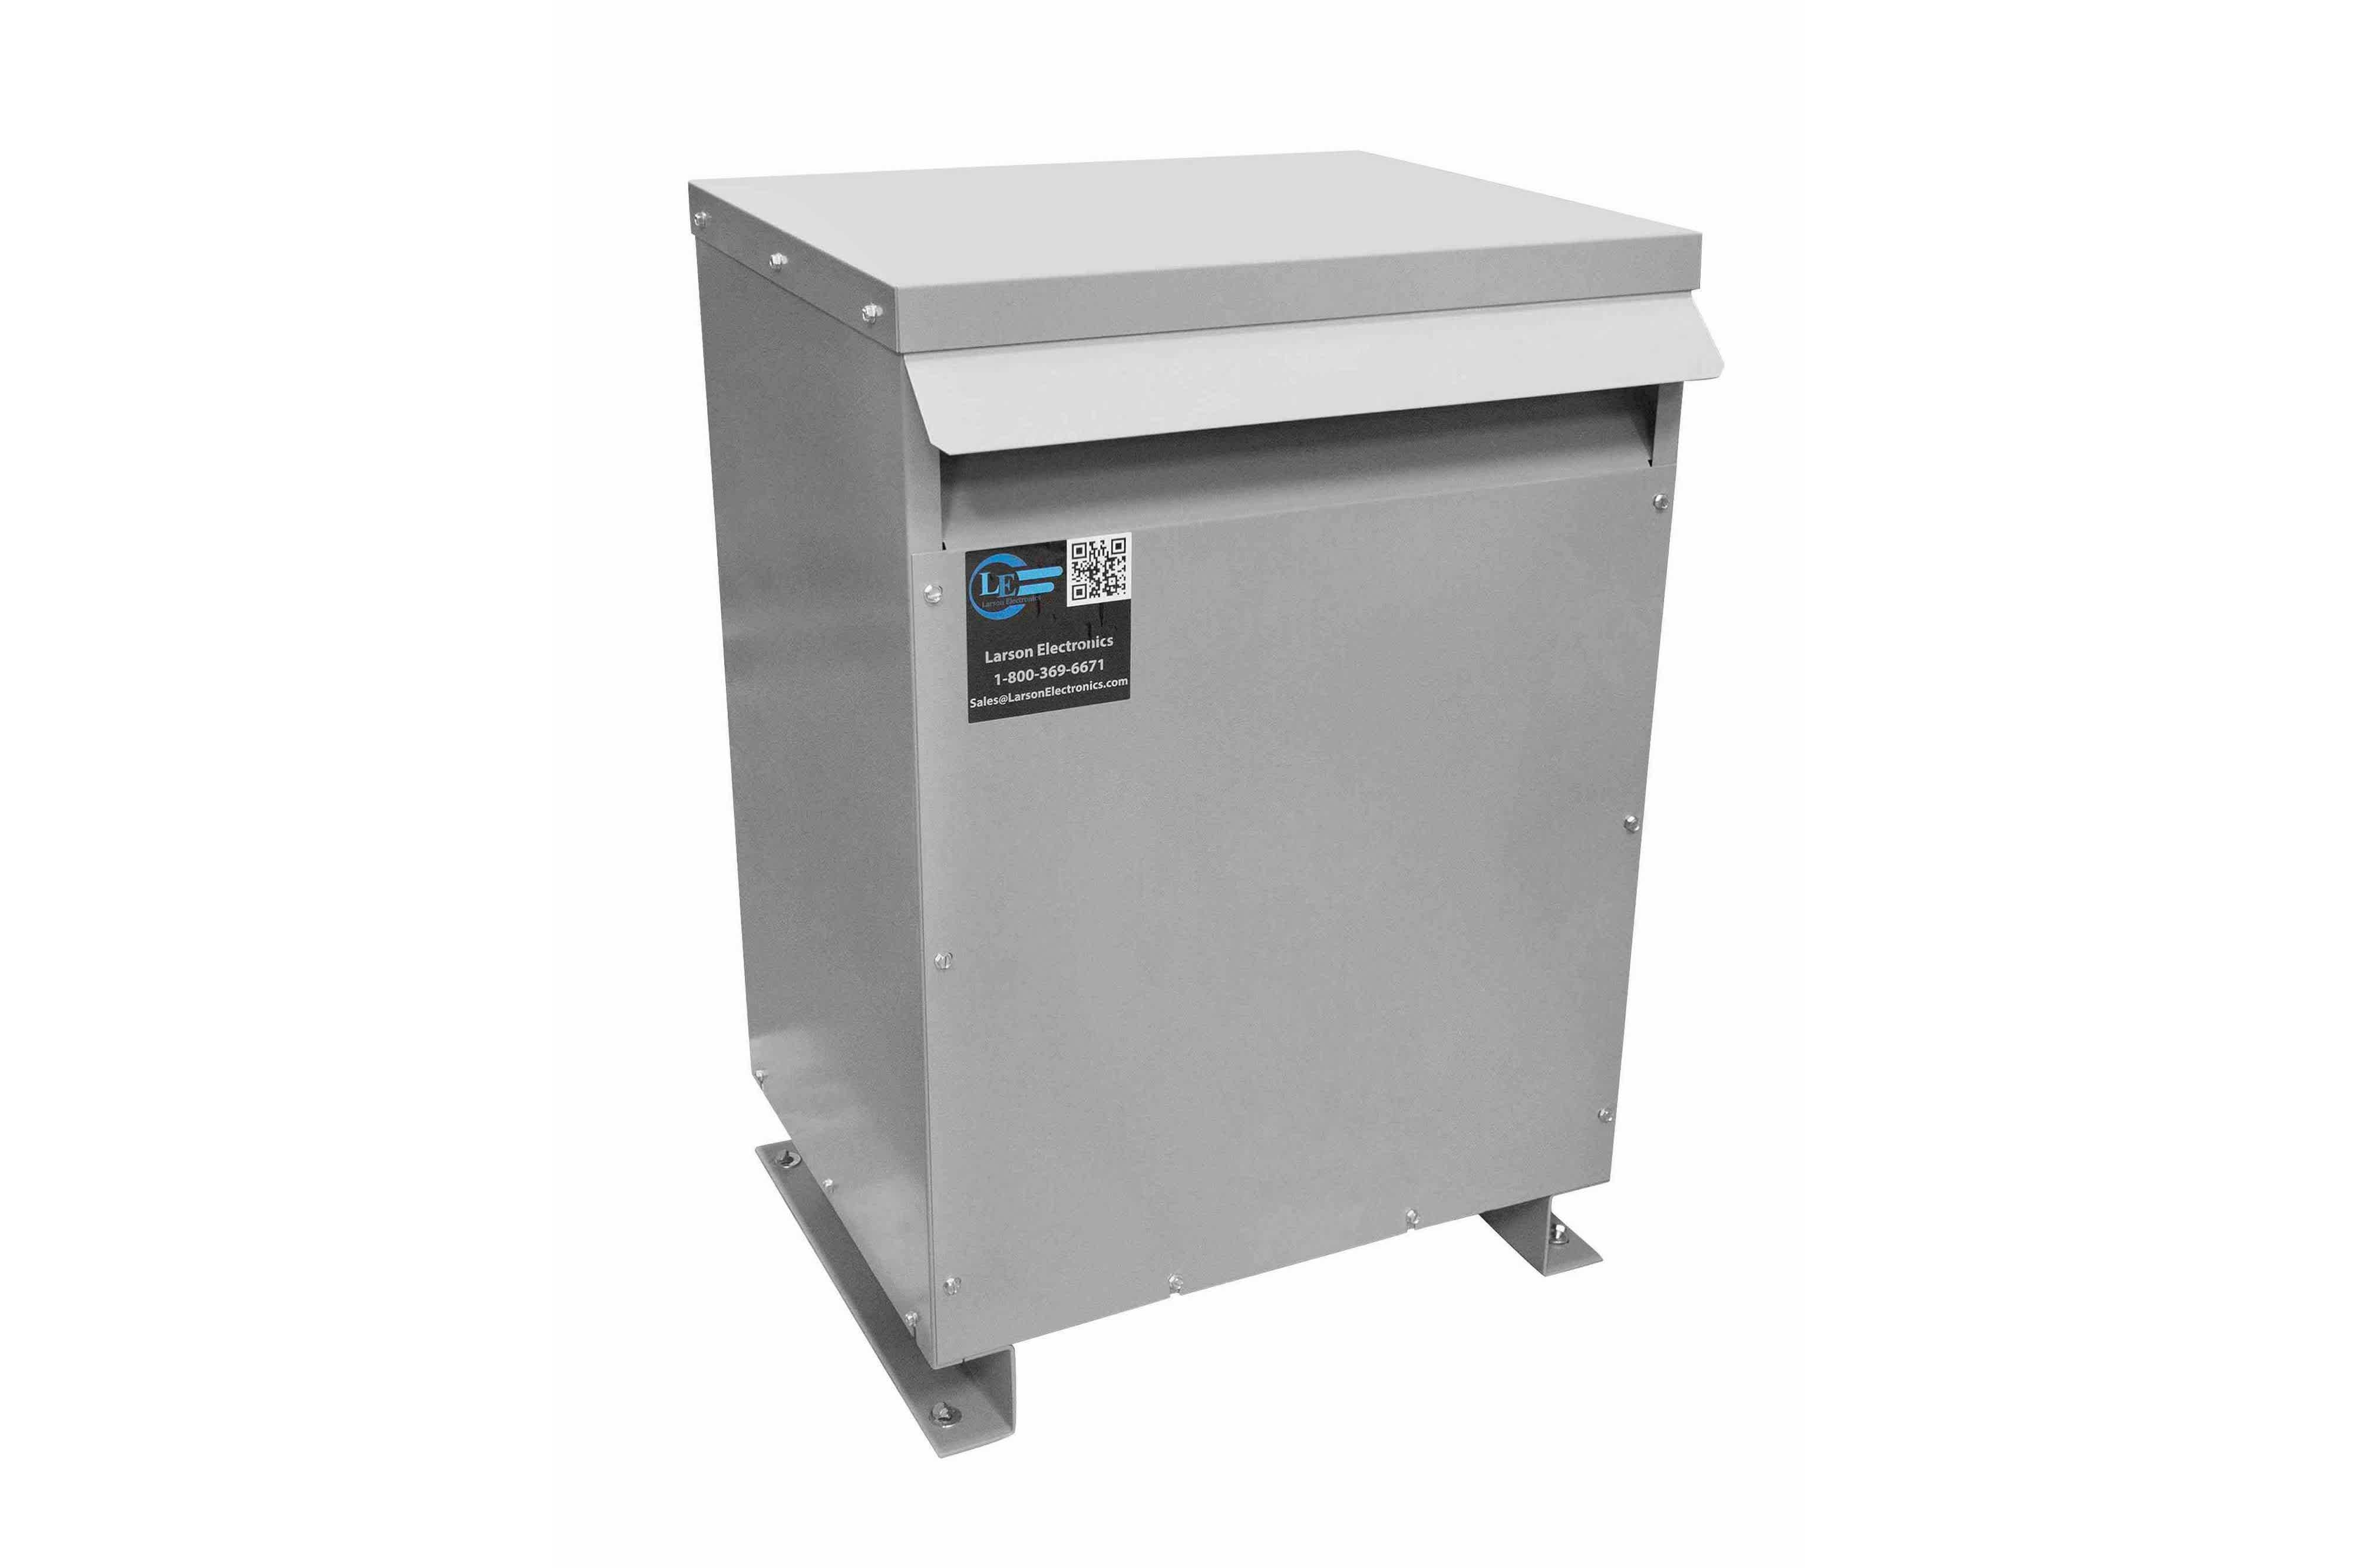 55 kVA 3PH Isolation Transformer, 575V Wye Primary, 415V Delta Secondary, N3R, Ventilated, 60 Hz